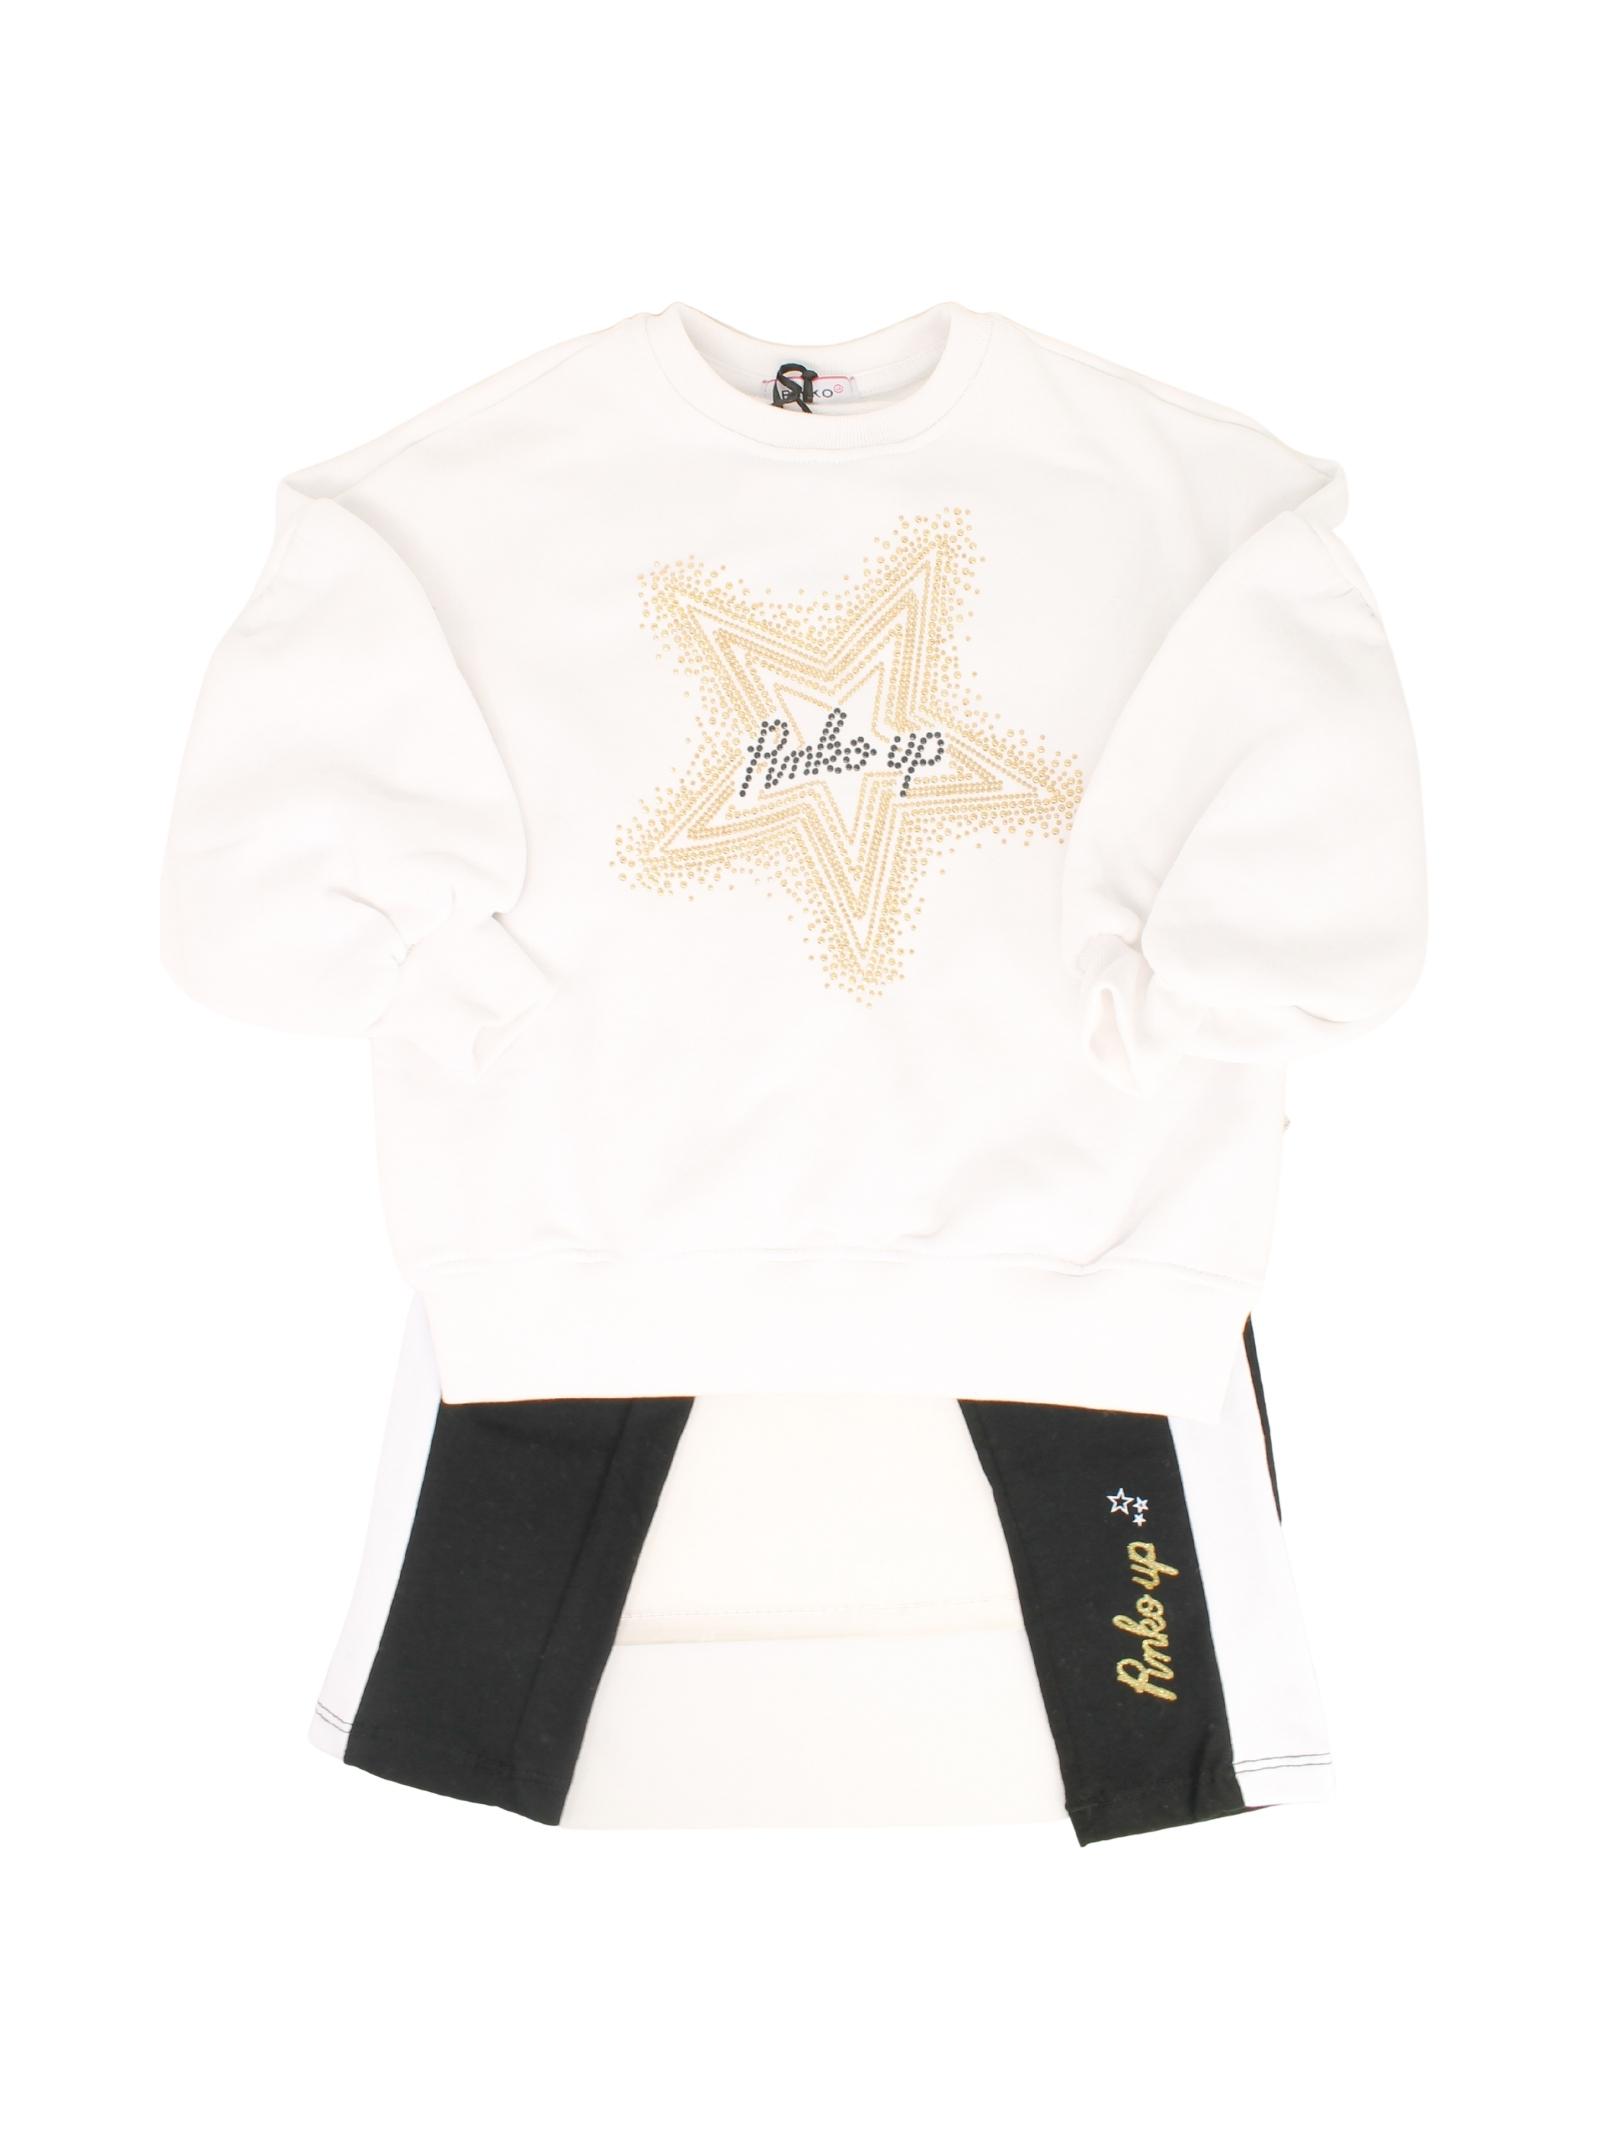 Completo Stars Black White Bambina PINKO UP | Completi | 029002002/13